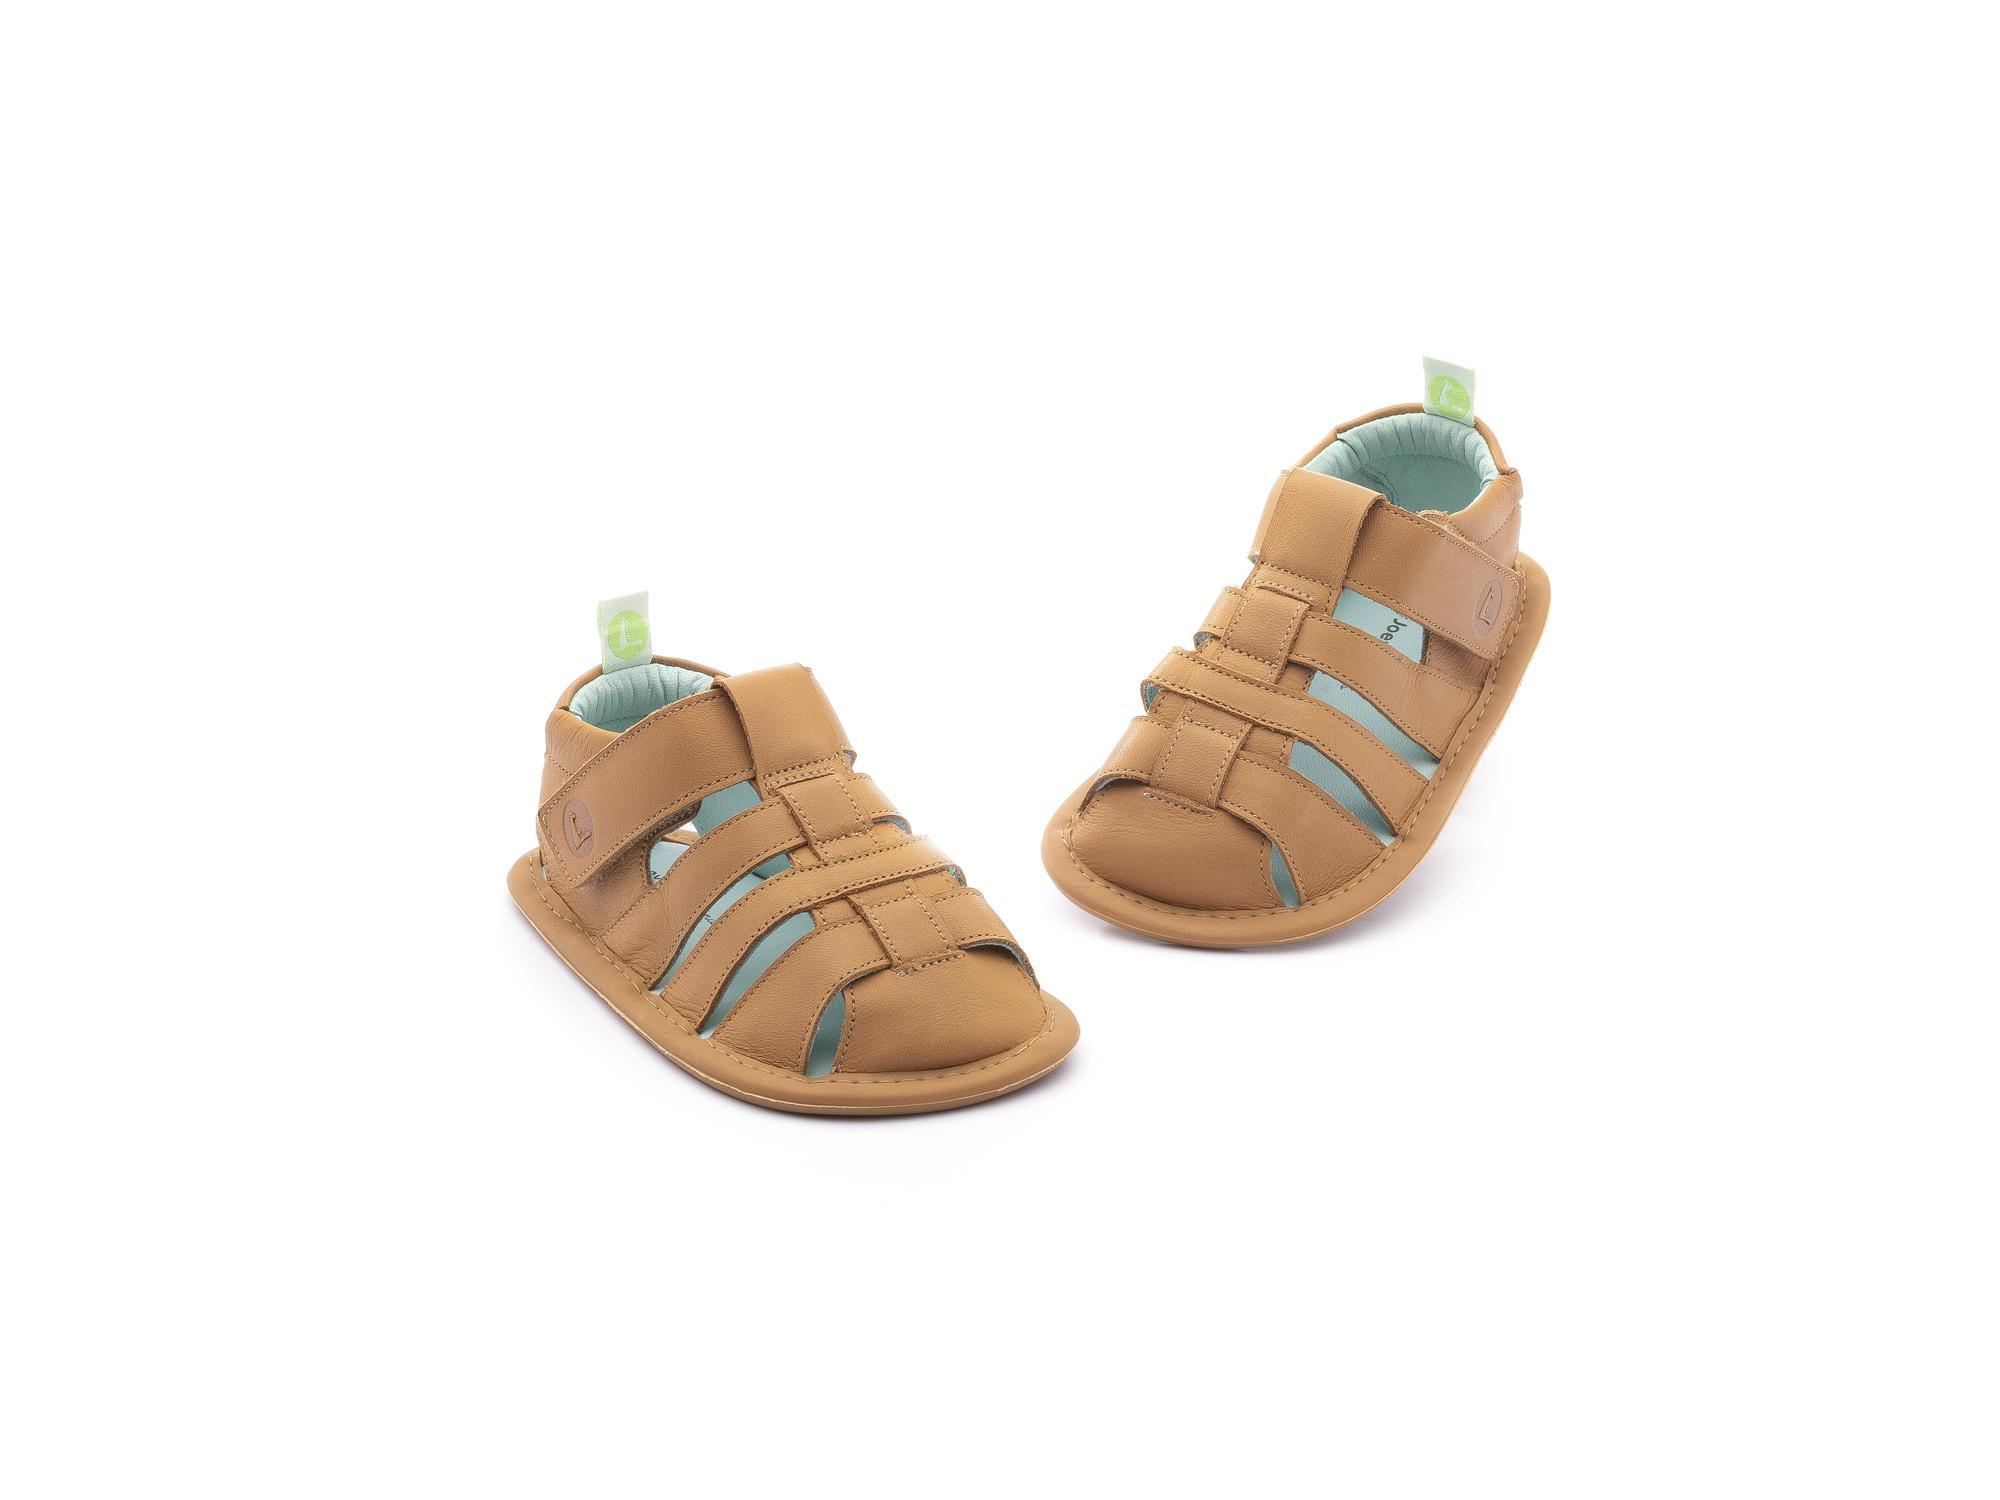 Sandália Sandy Hay Baby 0 à 2 anos - 3